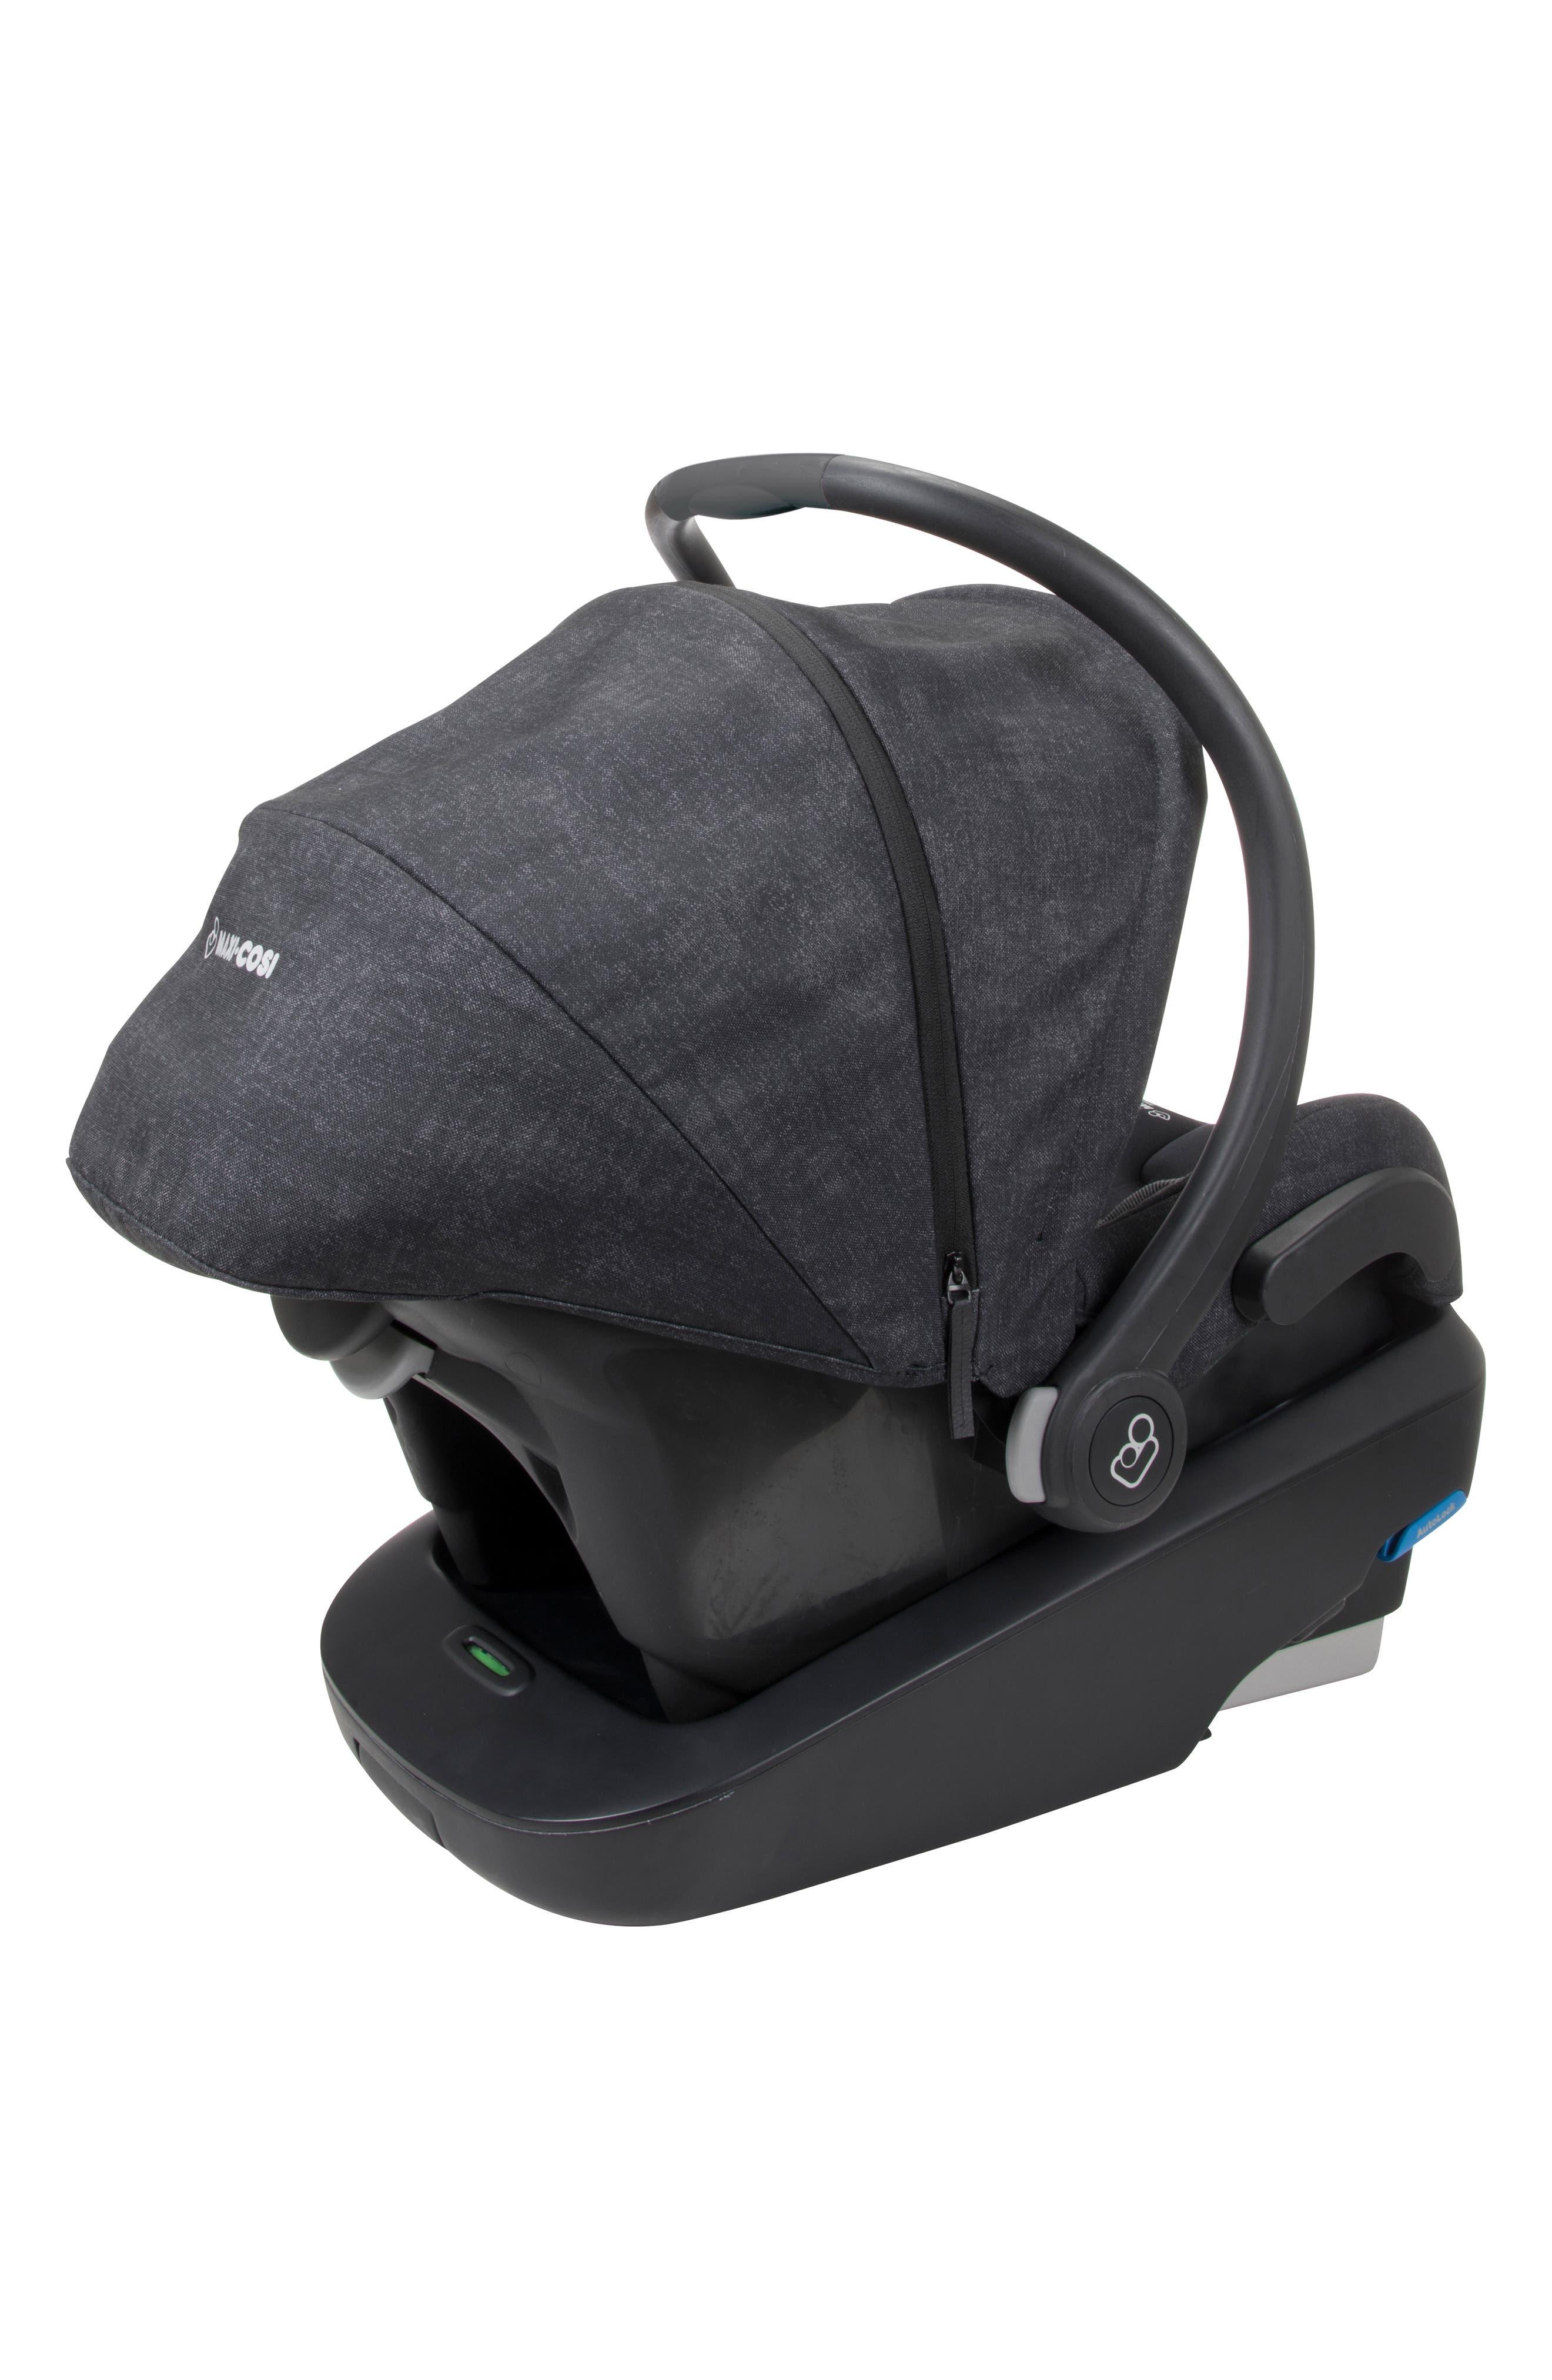 Mico Max Plus Infant Car Seat,                             Alternate thumbnail 2, color,                             NOMAD BLACK